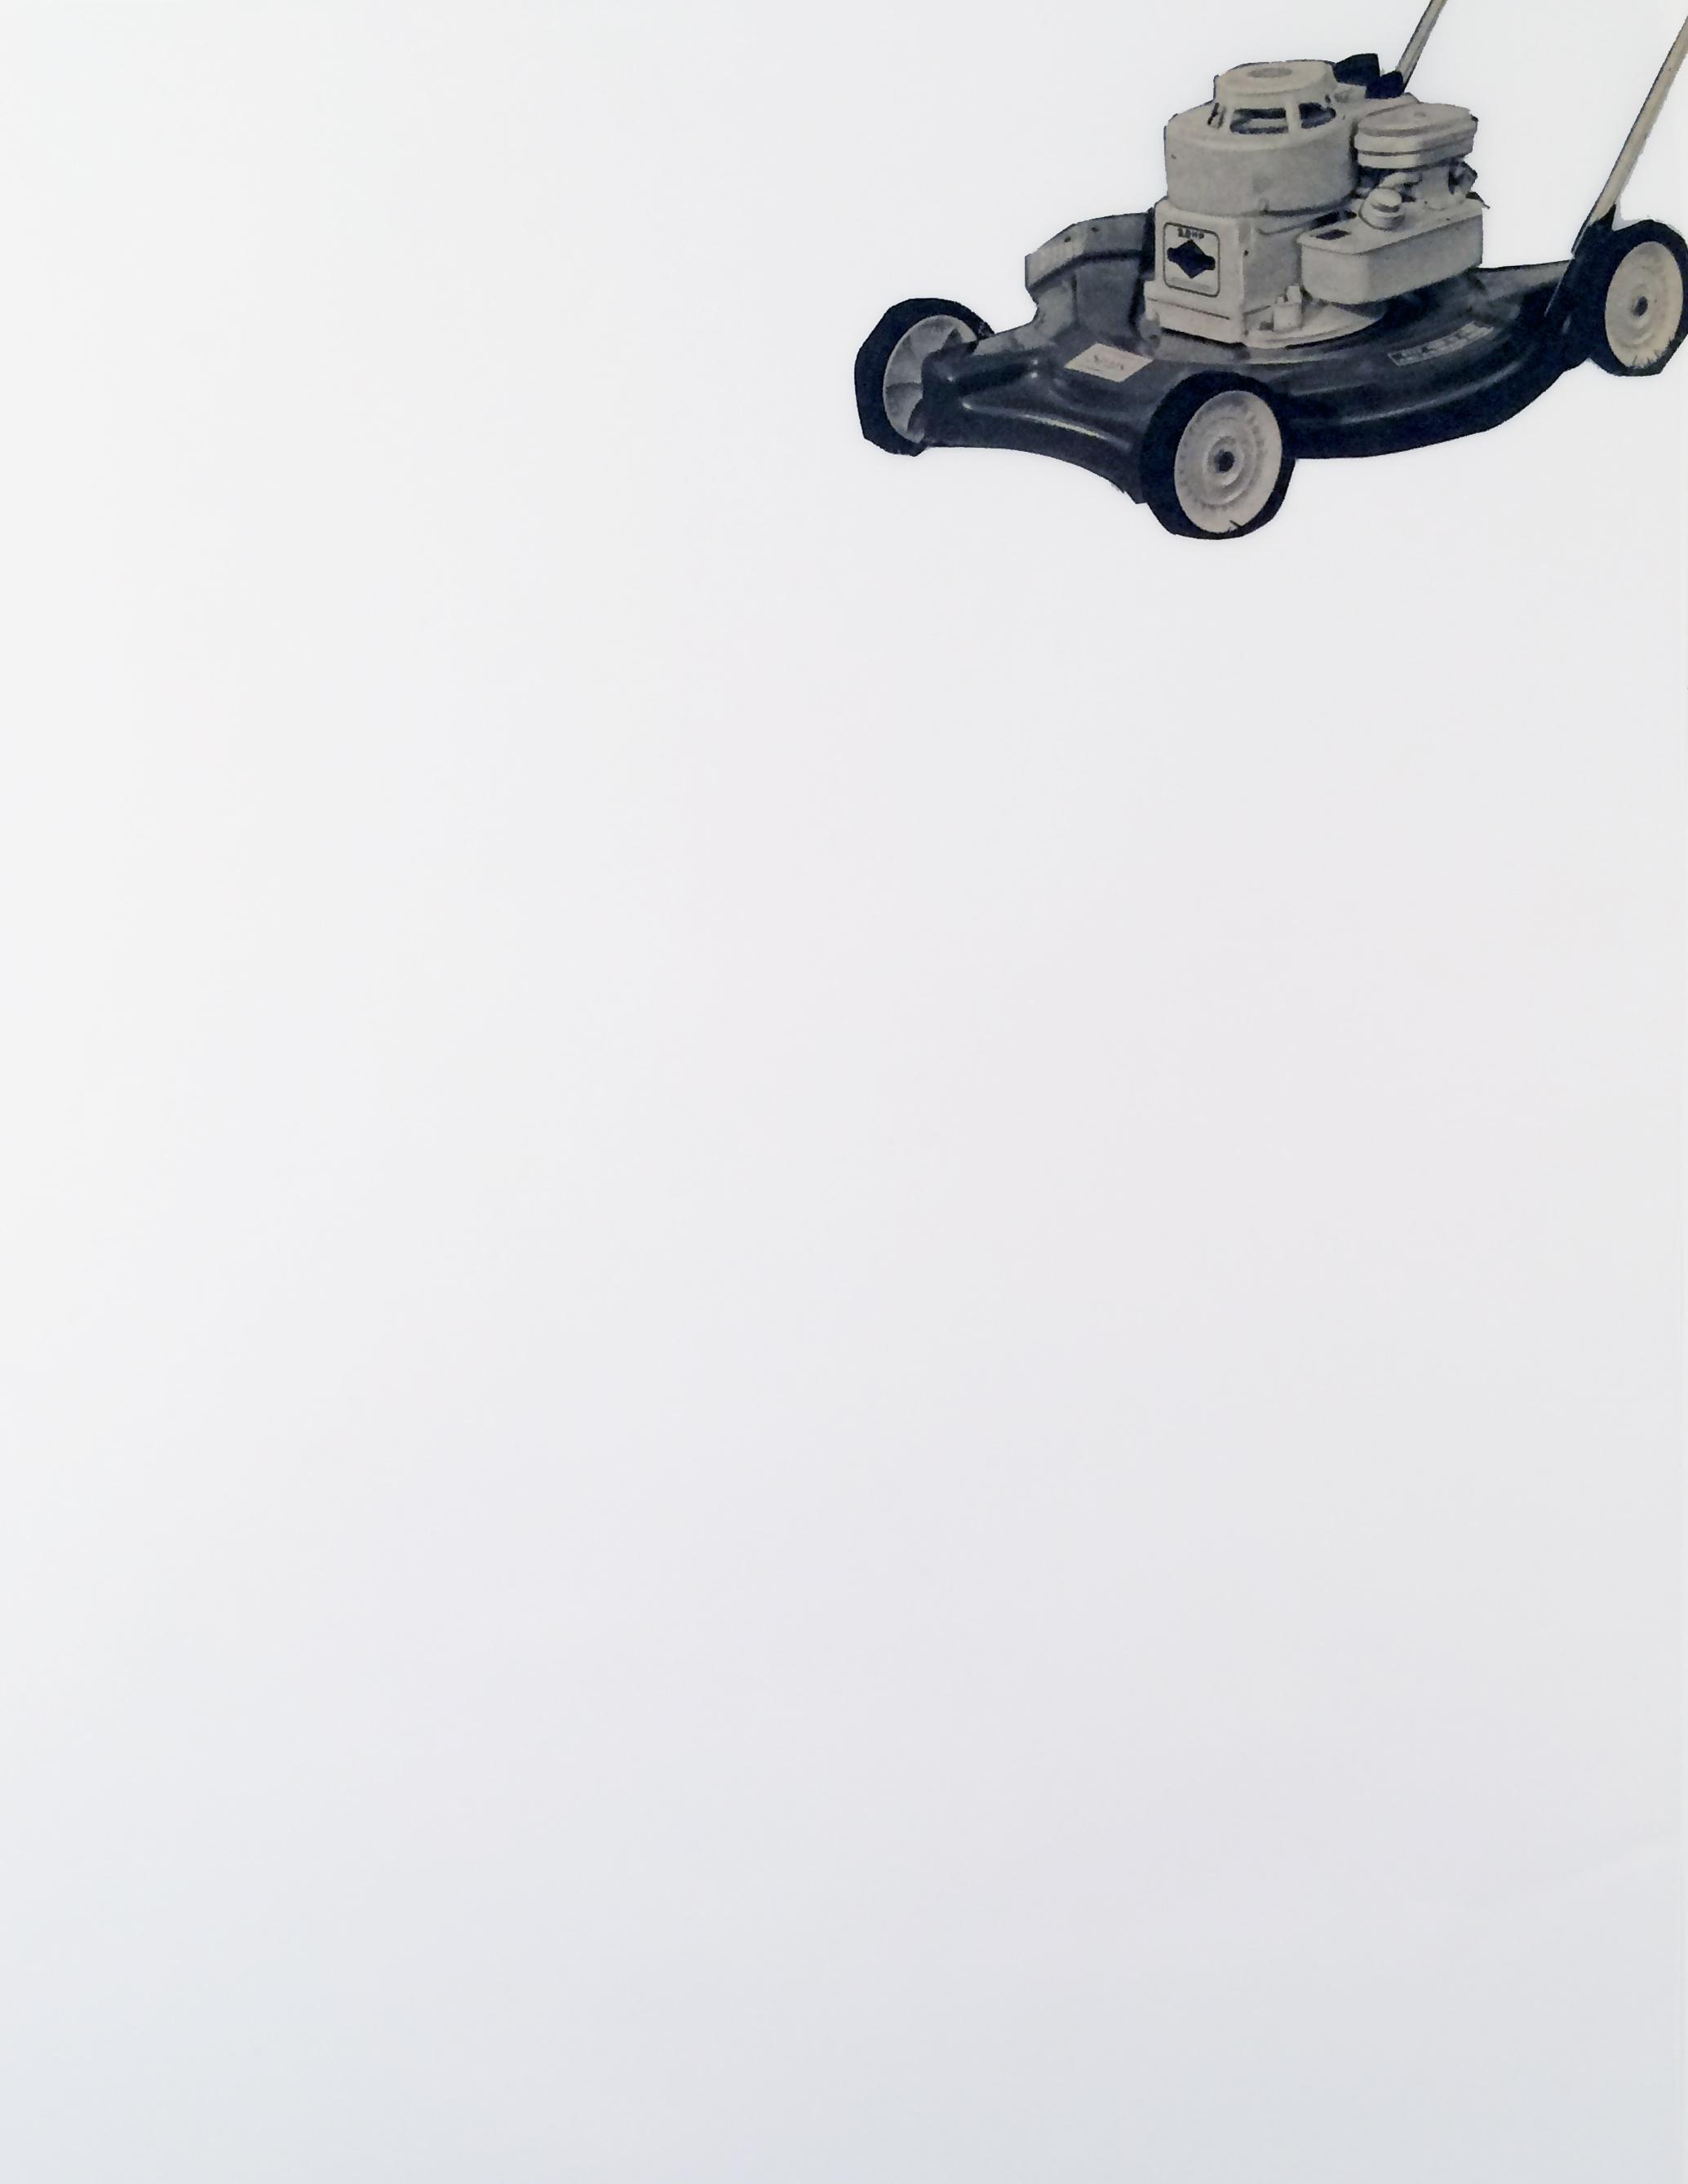 CATALOGUE - Reddimaid ADJUST - lawnmower WHT.jpg